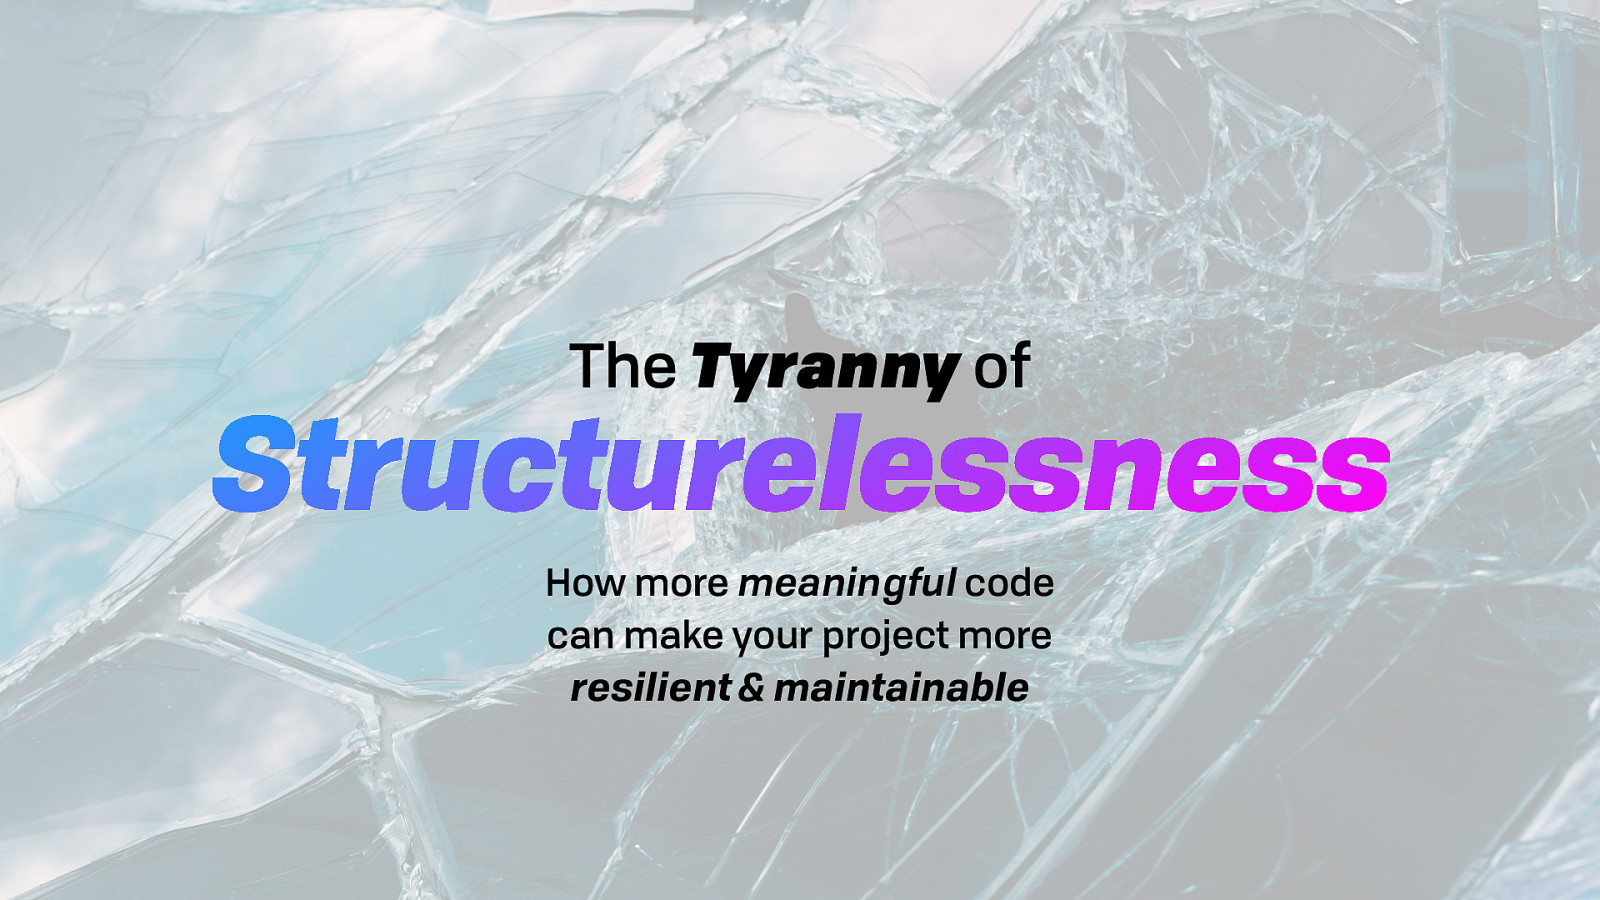 Tryranny of Structurelessness